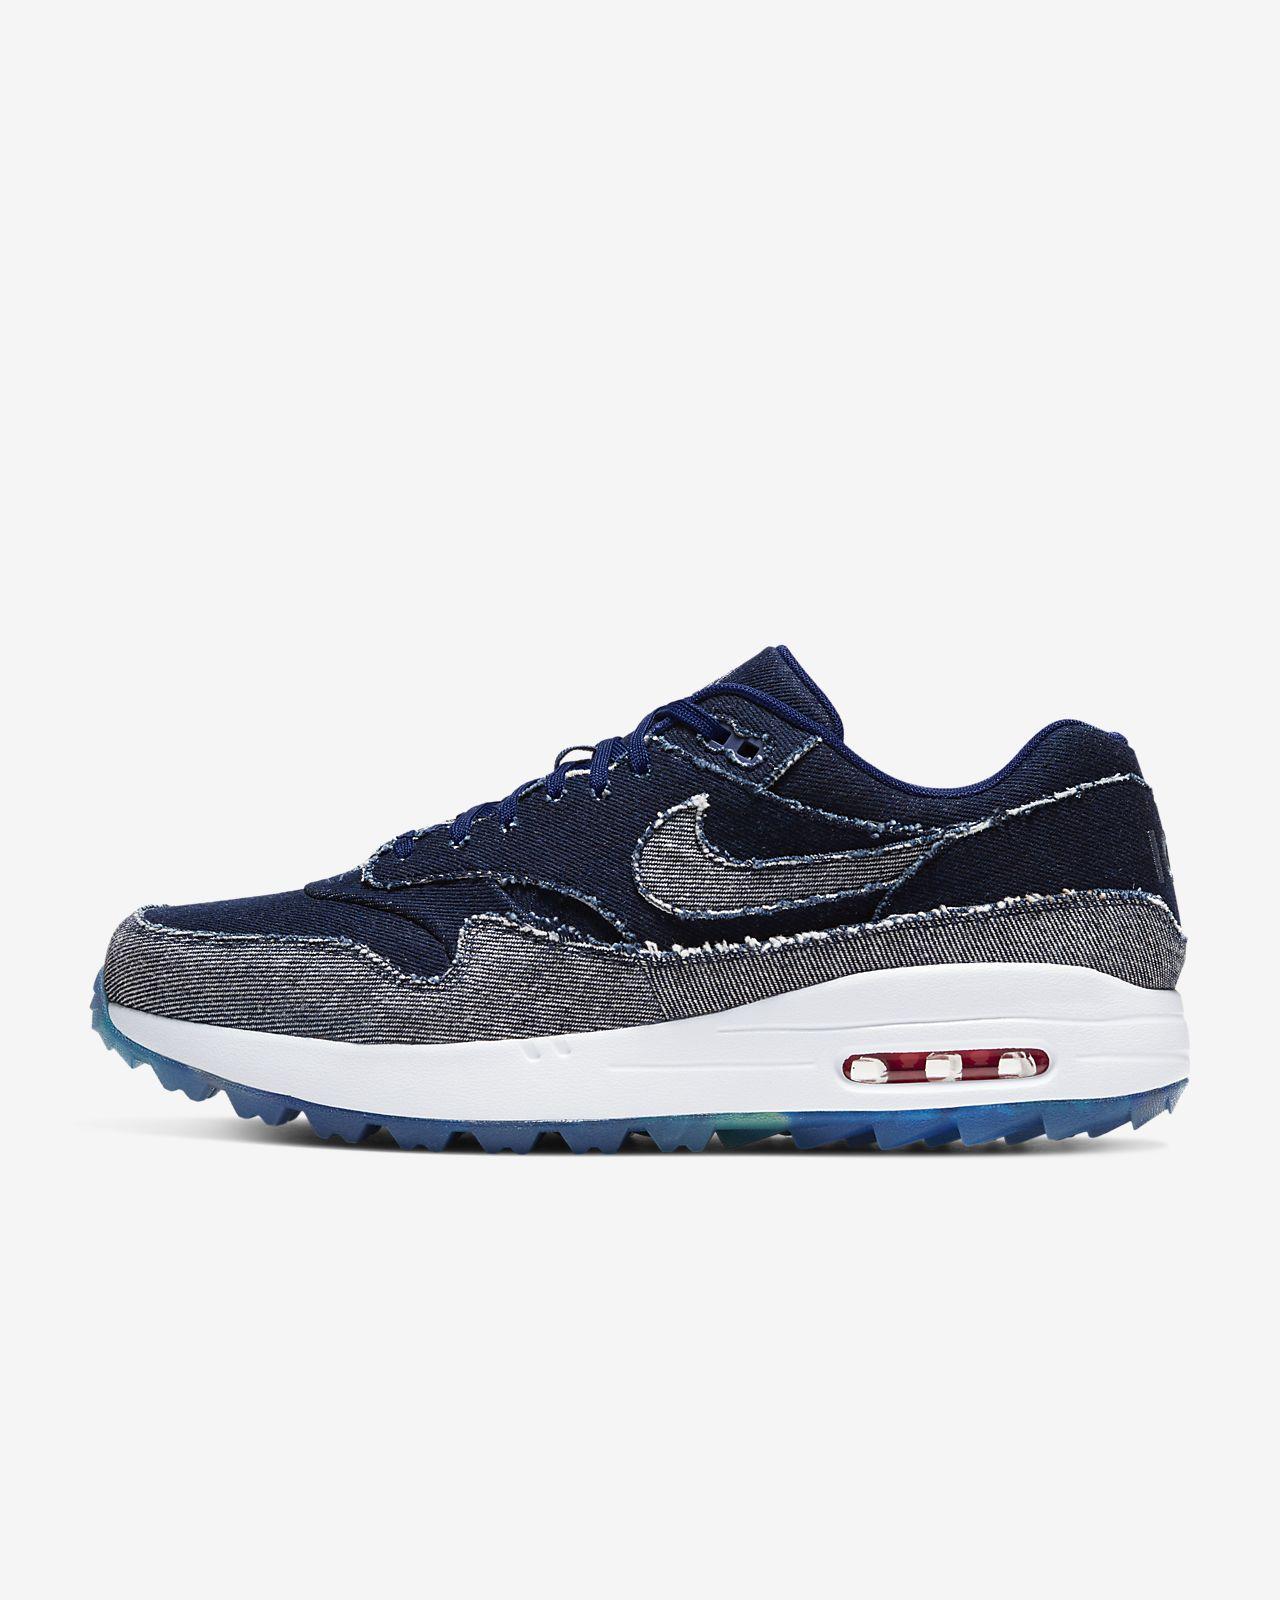 Nike Air Max 1 G NRG Men's Golf Shoe